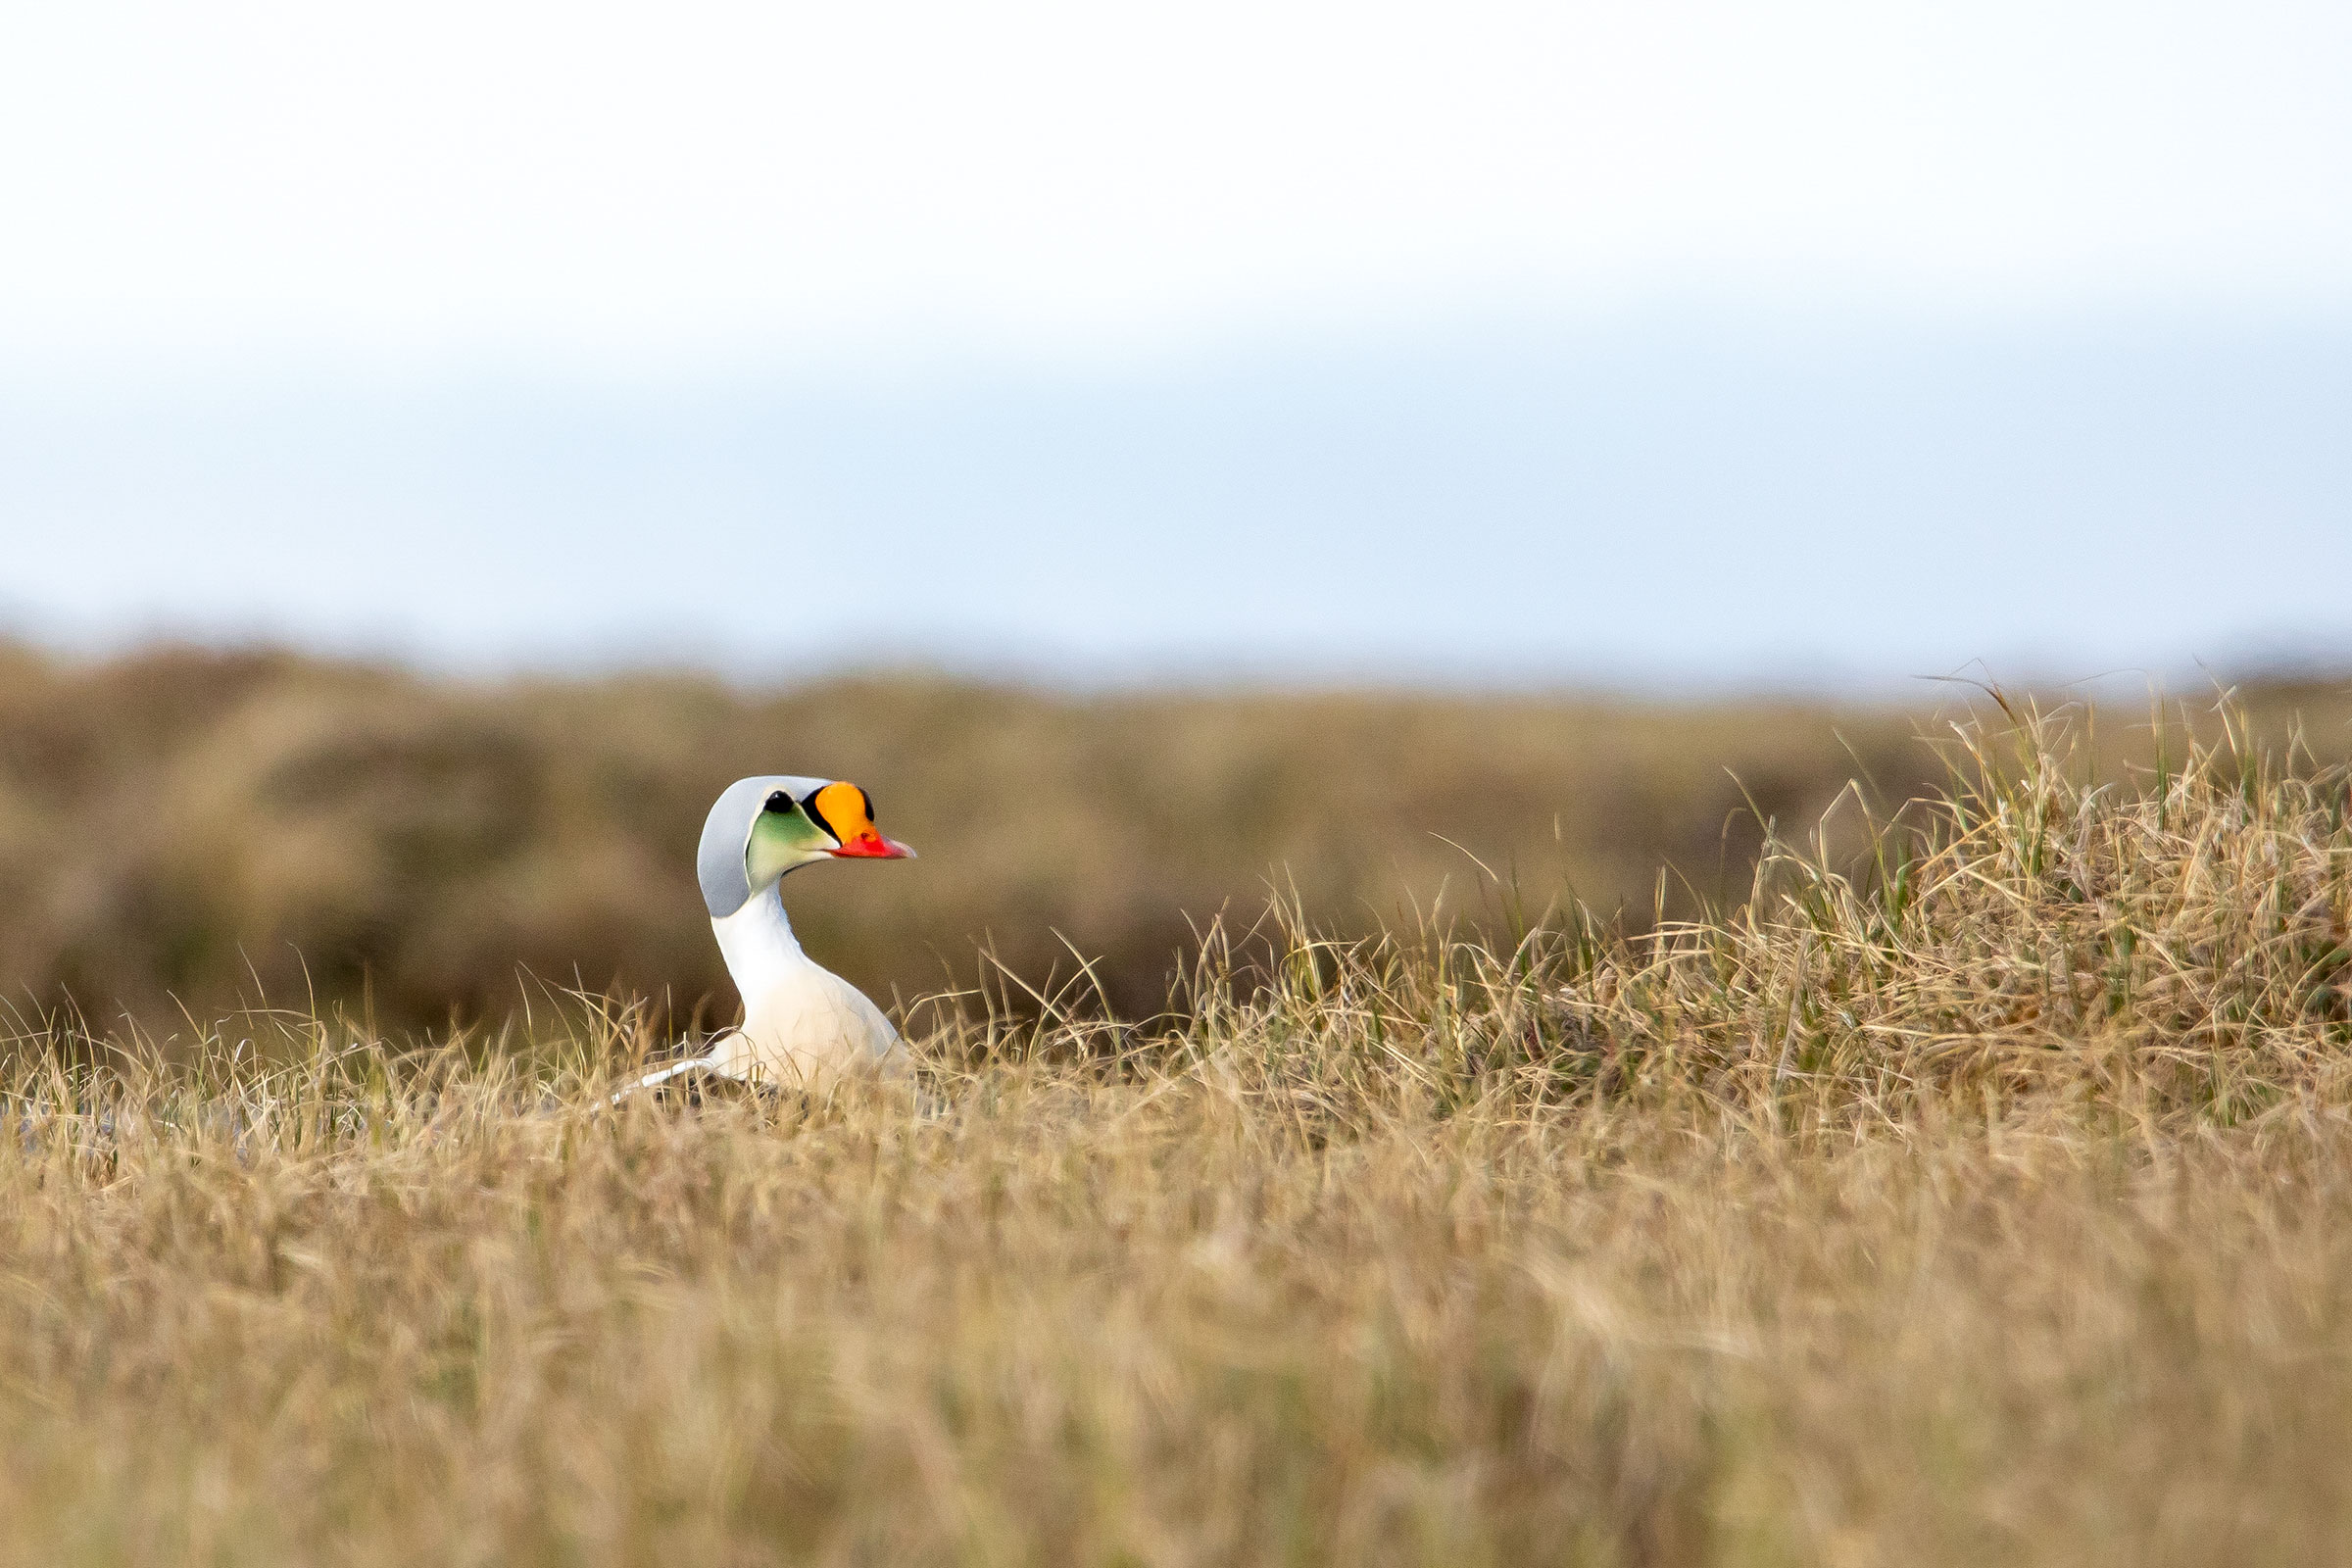 King Eider in the Arctic National Wildlife Refuge. Lisa Hupp/USFWS